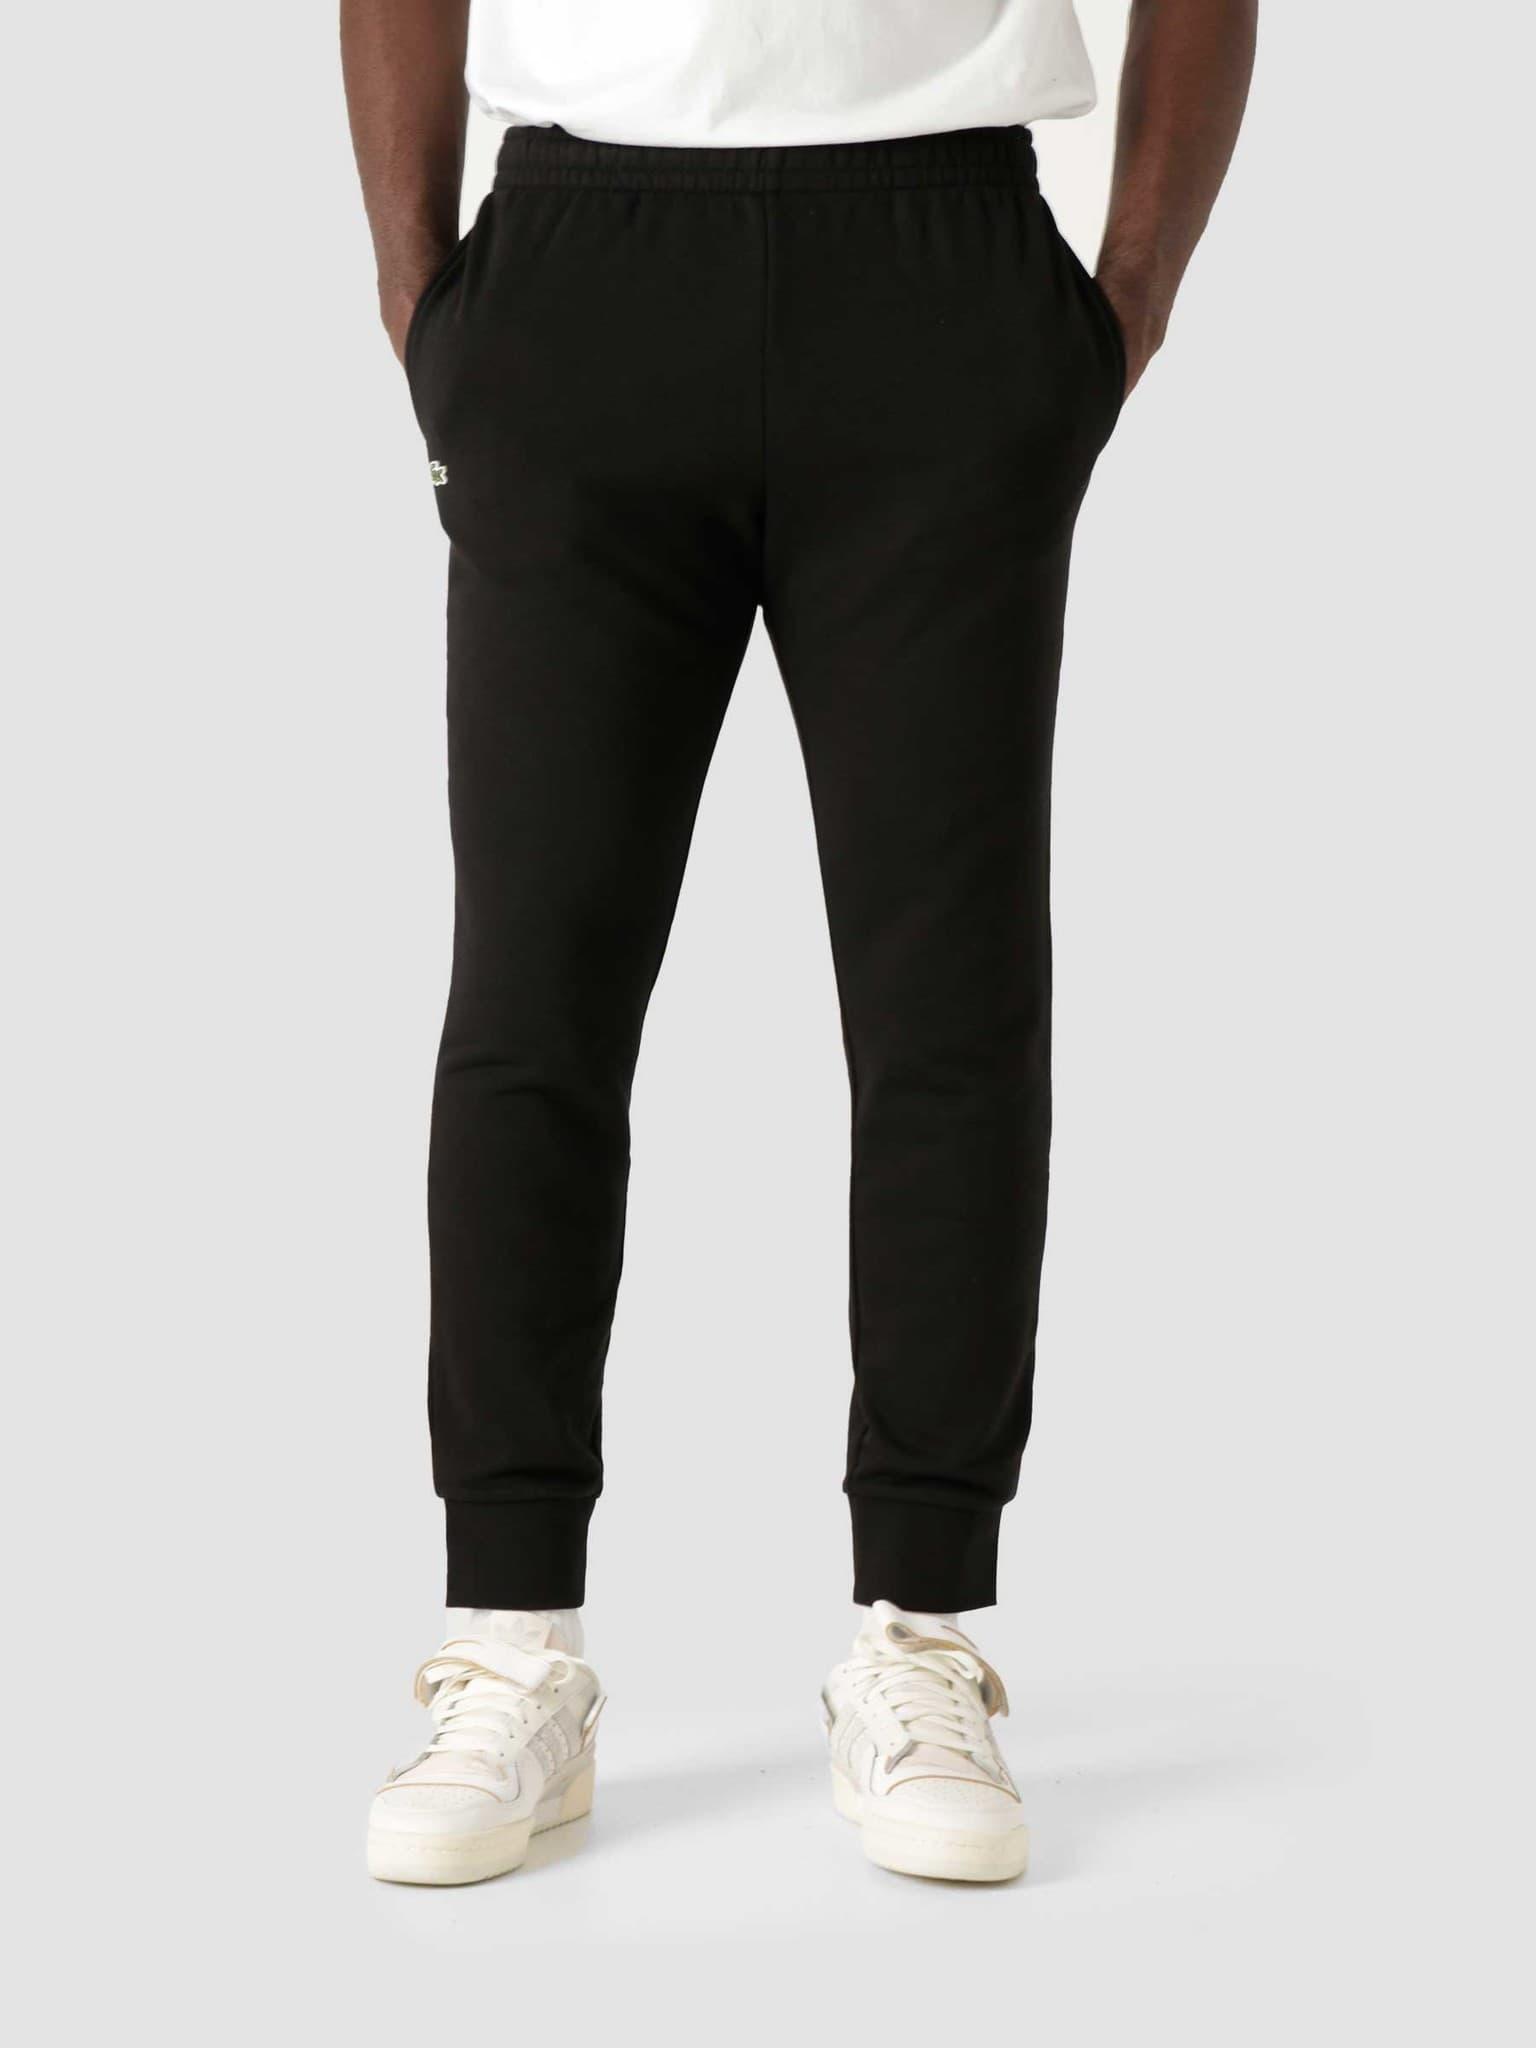 1HW2 Men's Tracksuit Trousers Black XH9507-11